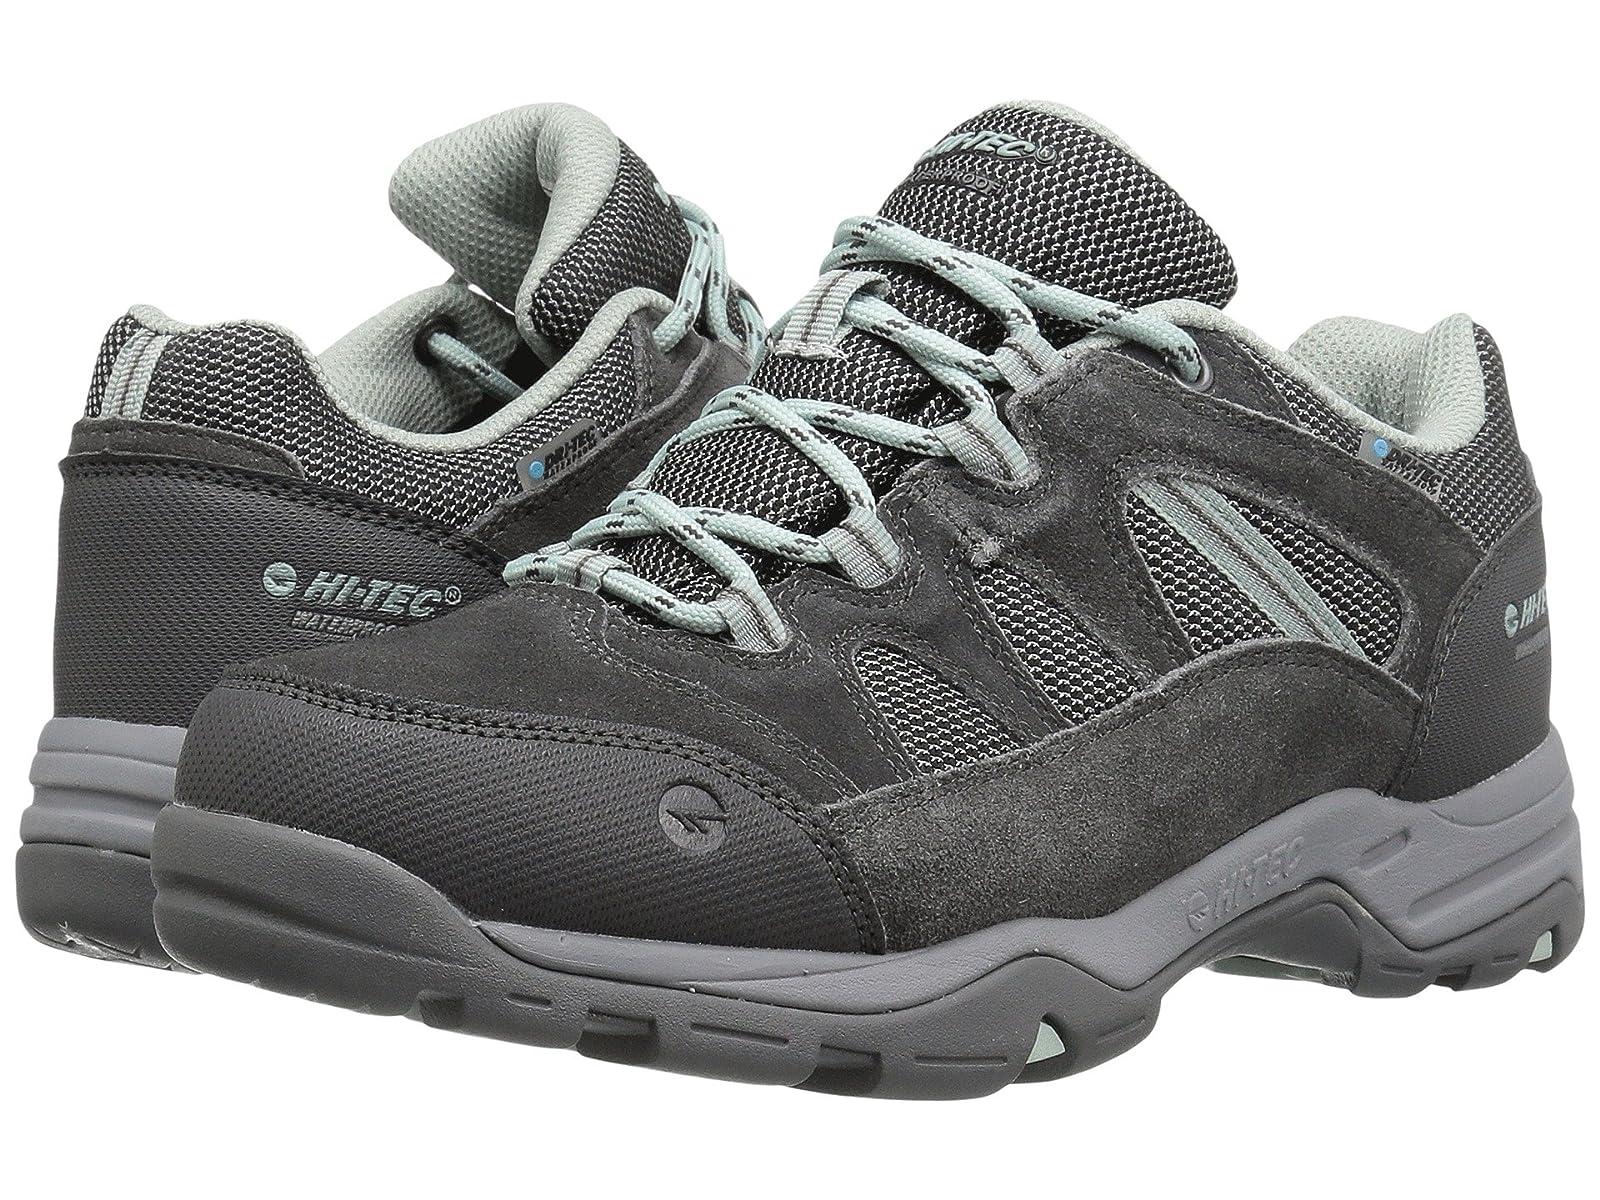 Hi-Tec Bandera II Low WaterproofCheap and distinctive eye-catching shoes